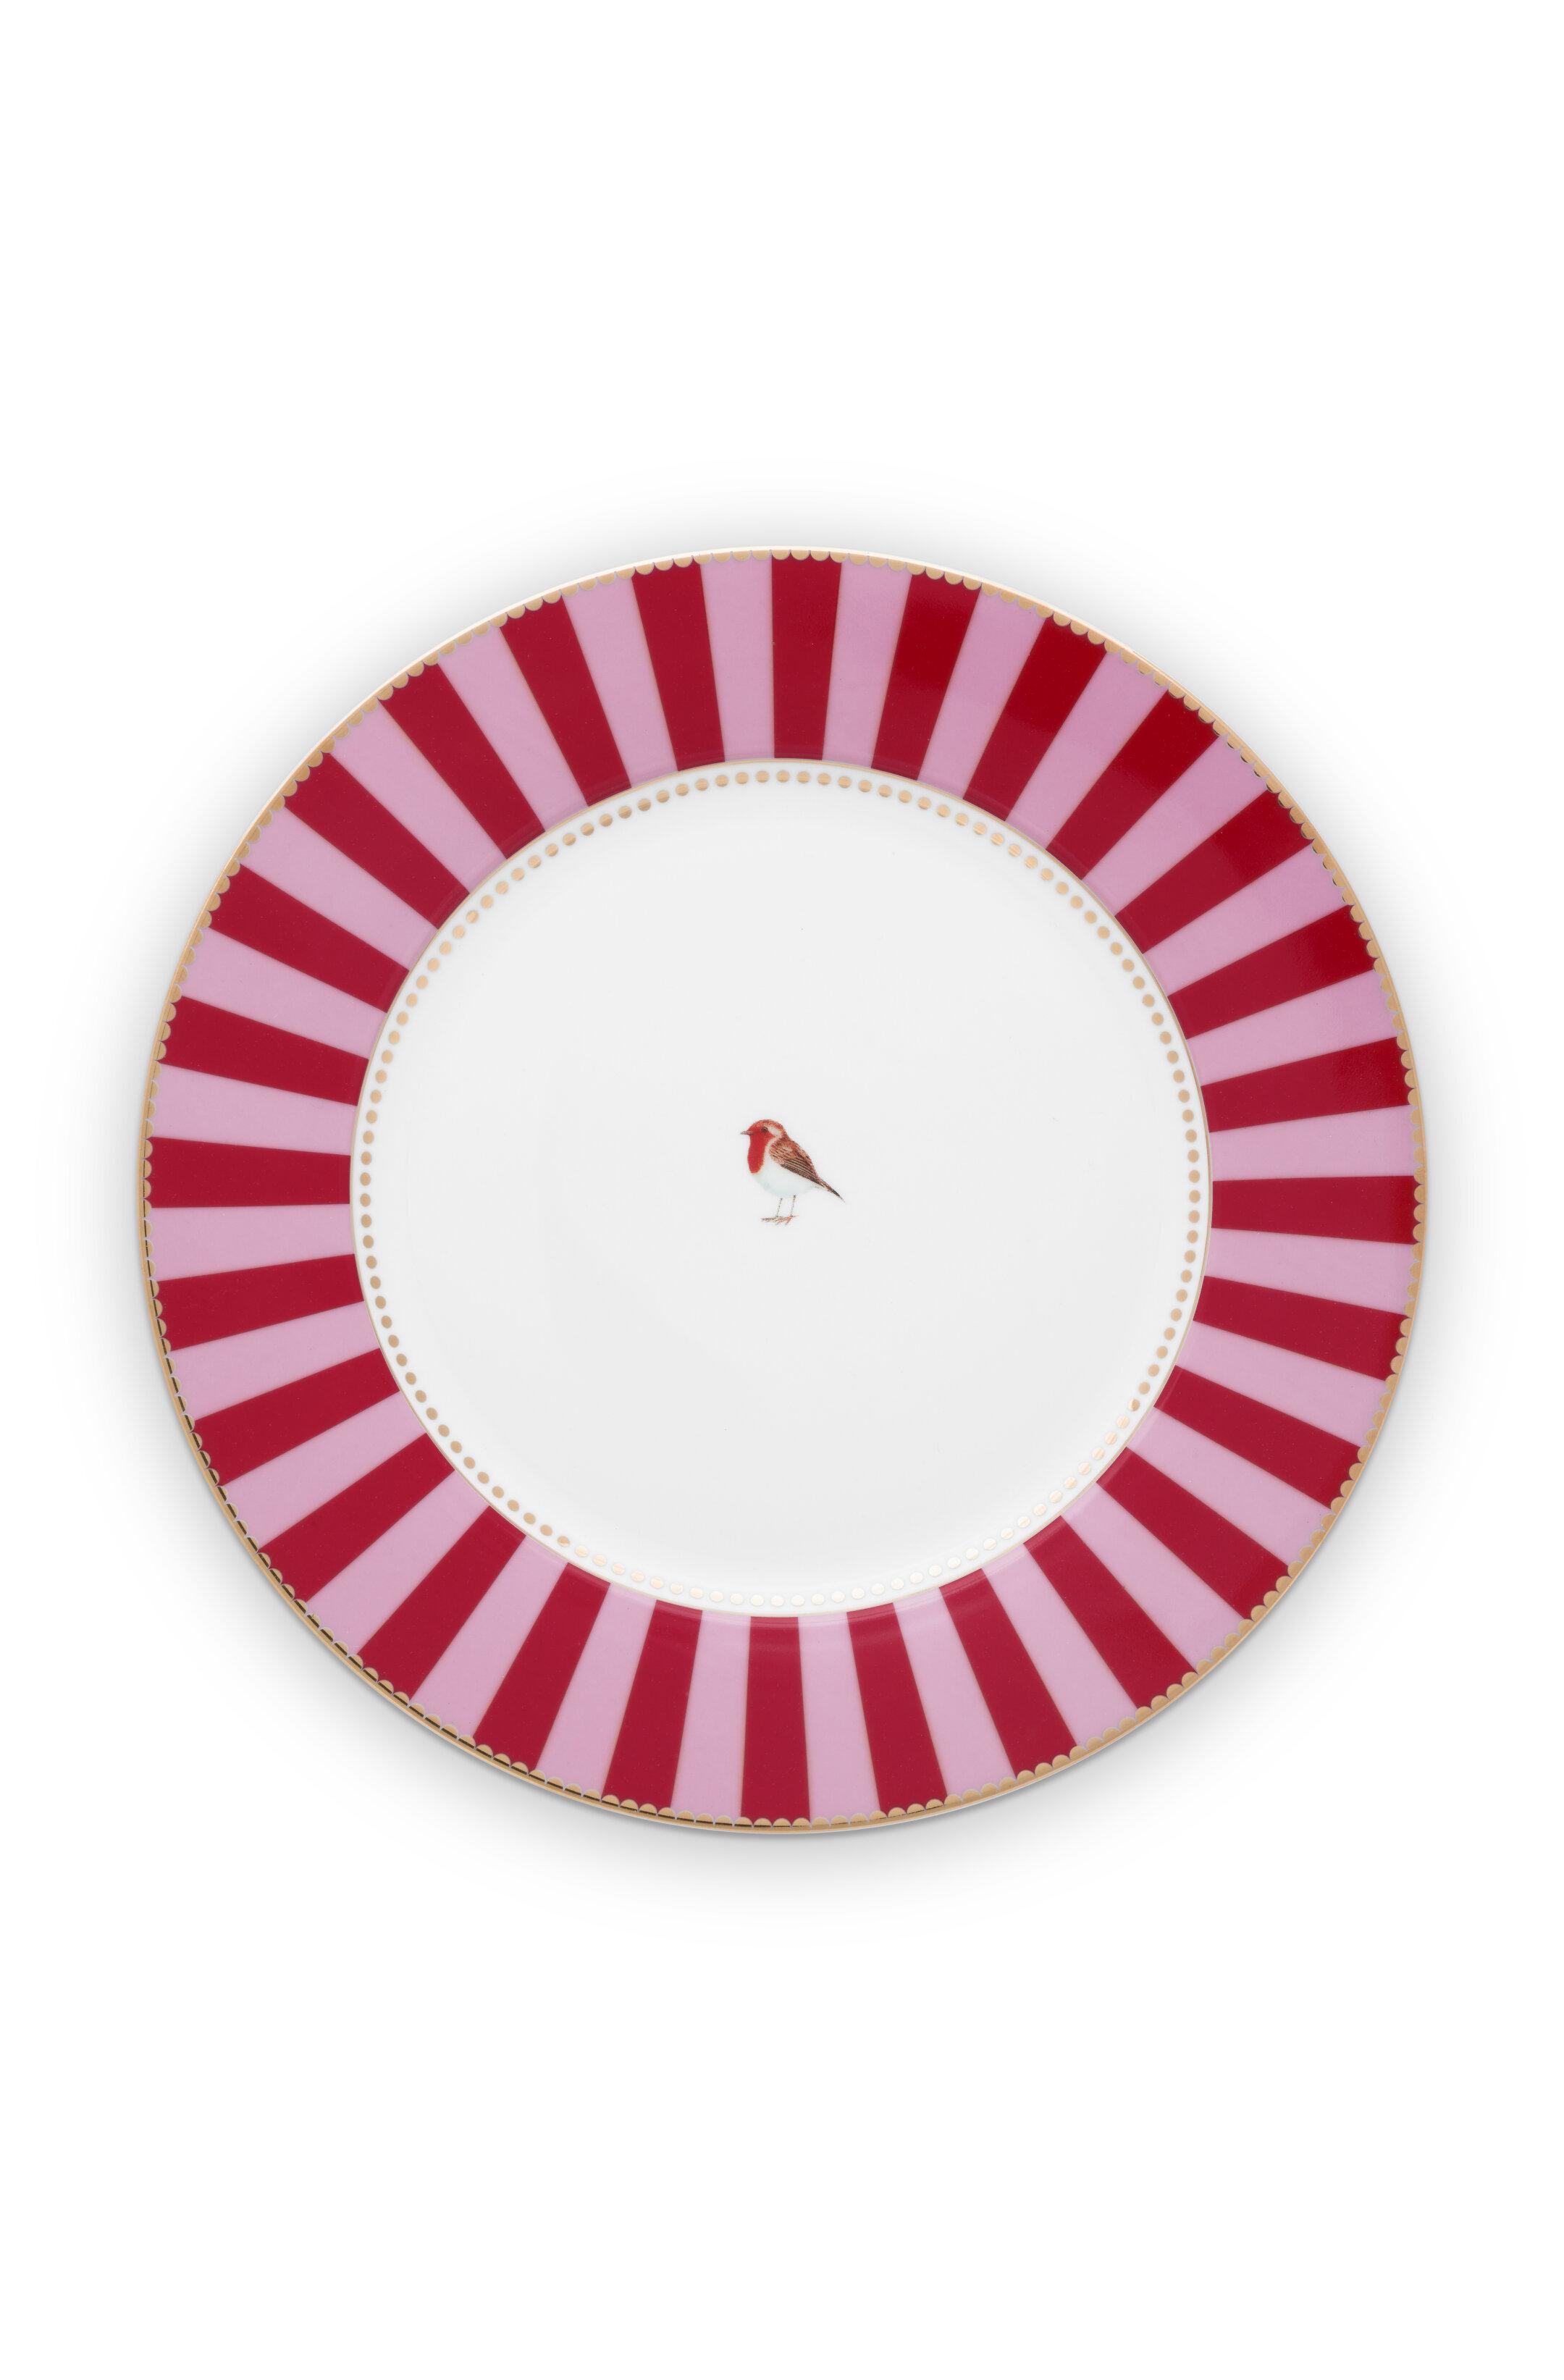 Pip Studio Love Birds Teller Stripes Red-Pink (26.5cm)